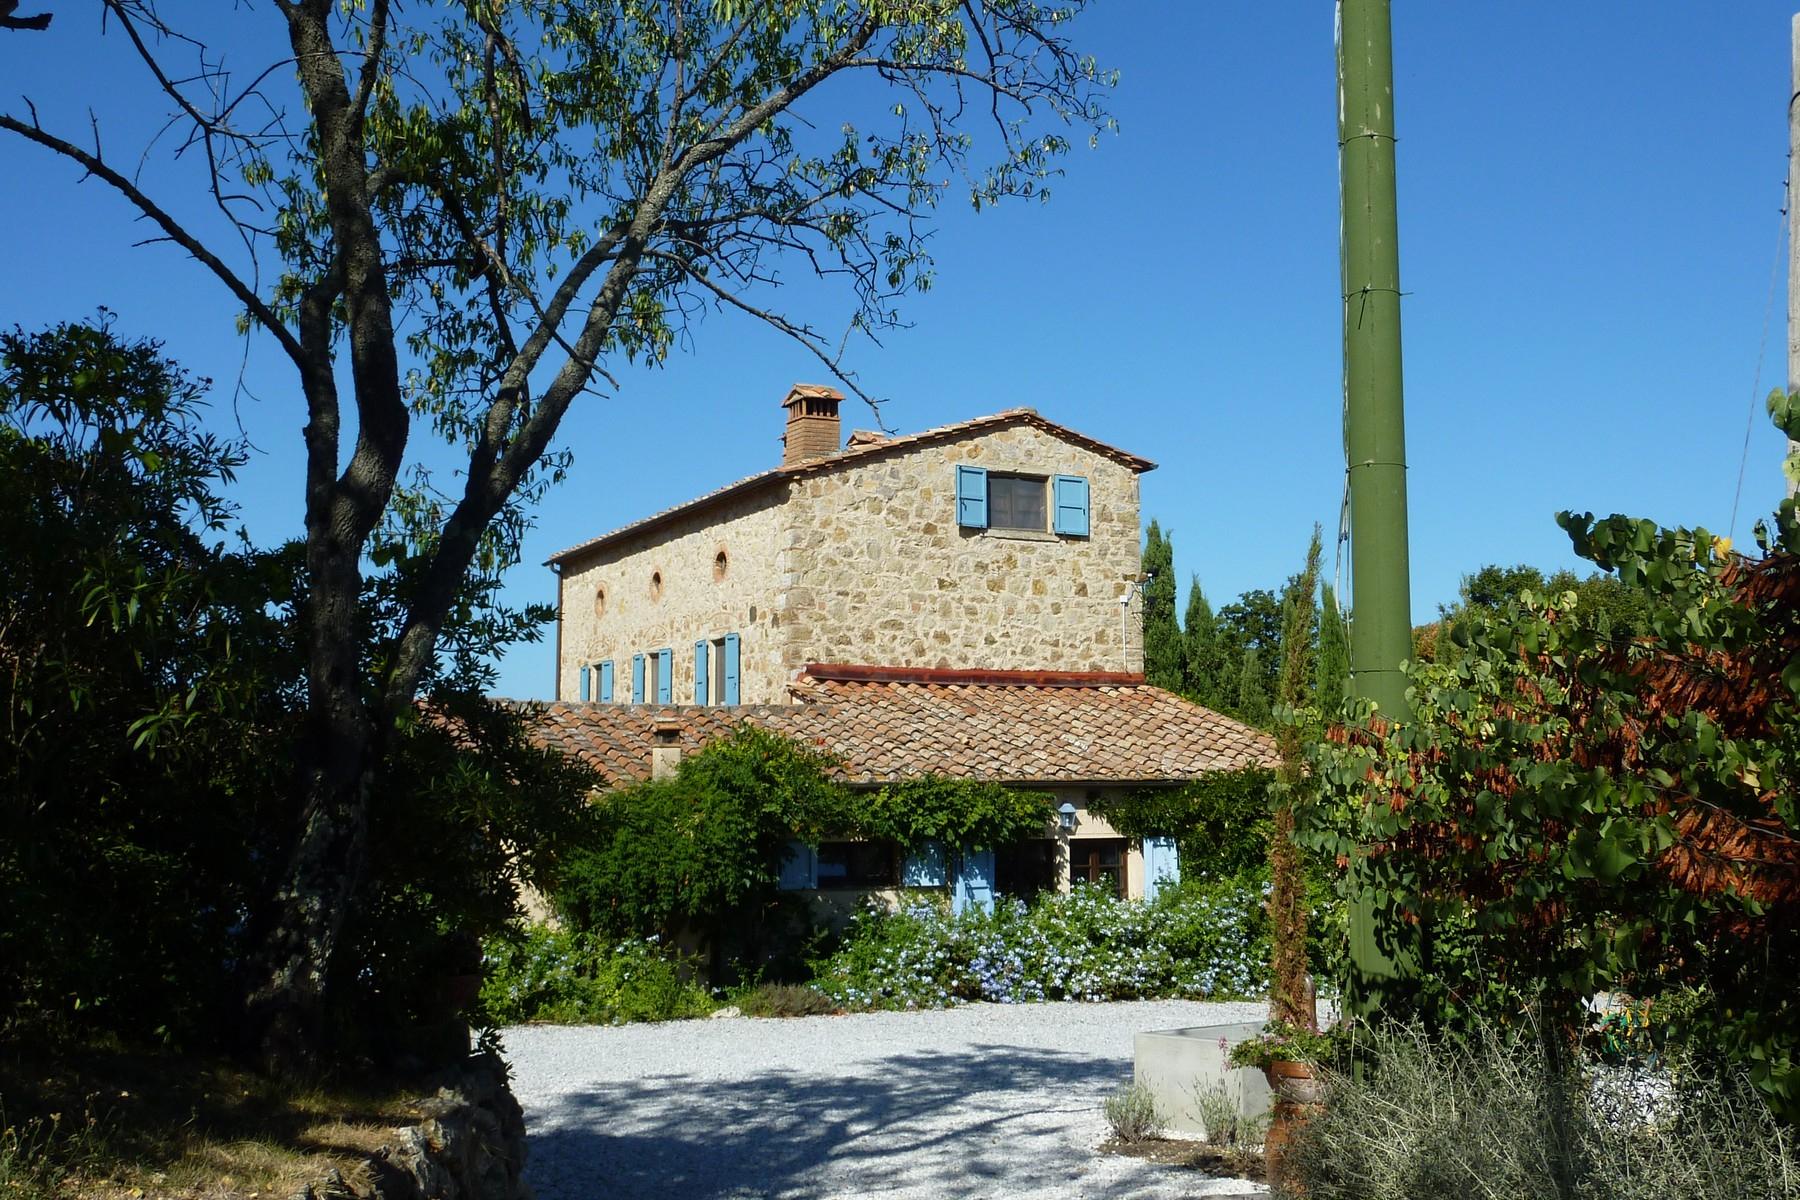 Villa in Vendita a Santa Luce: 5 locali, 270 mq - Foto 4